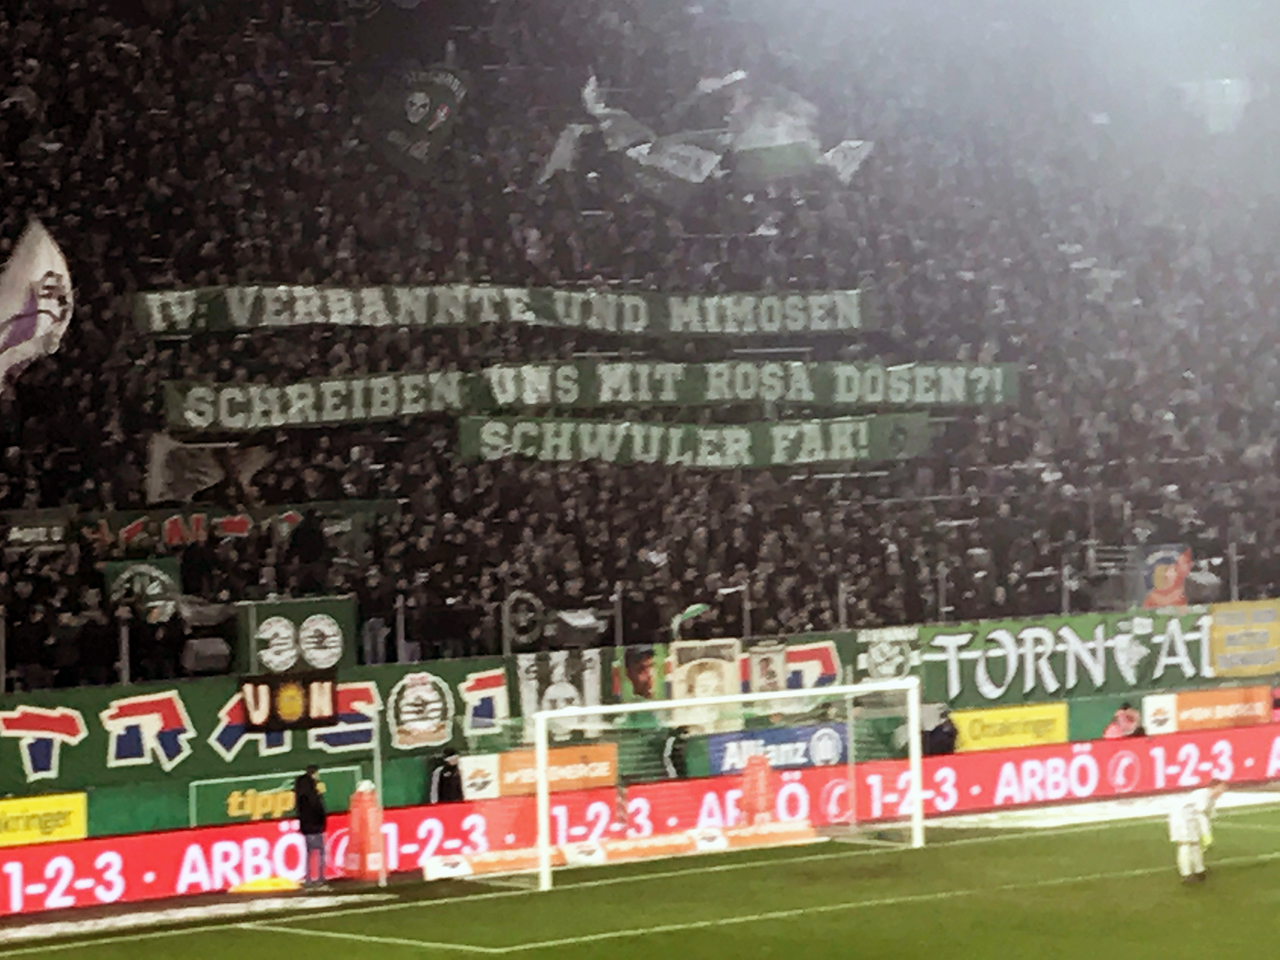 Bilder zu Homophobie in Fußball Szene - Aufkleber, Banner usw.